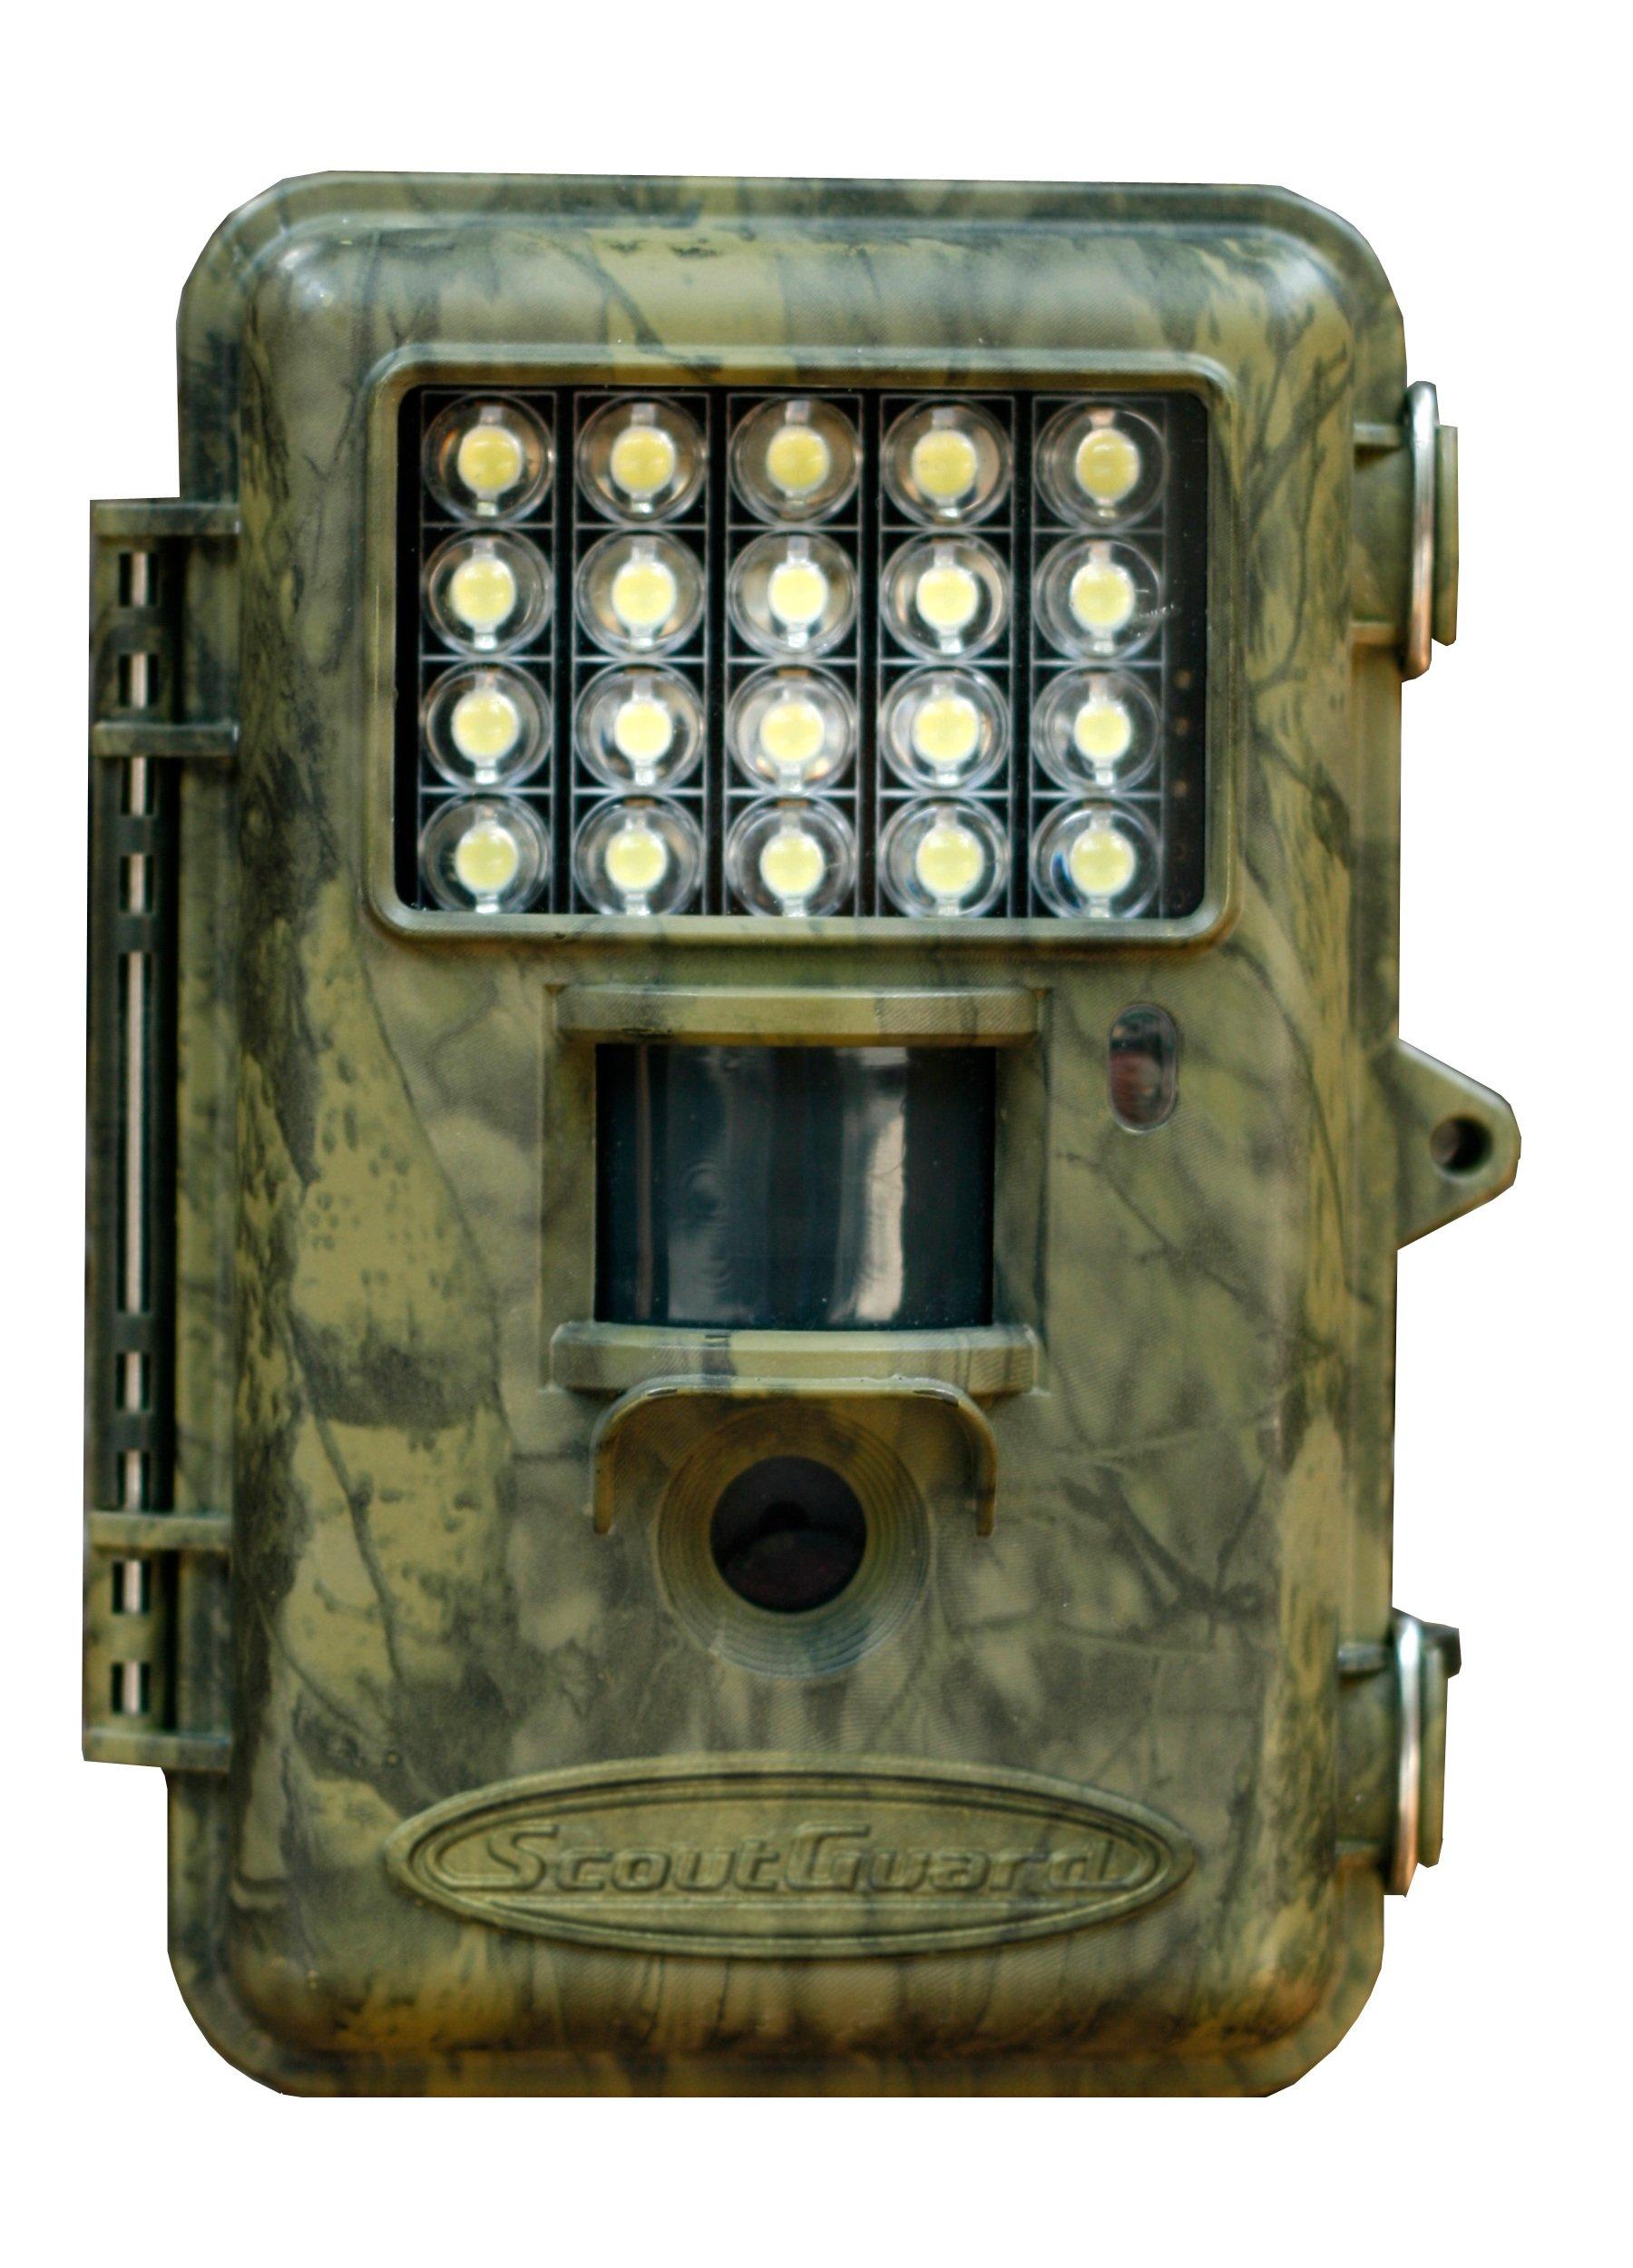 HCO SG560C Full Color Scouting Camera